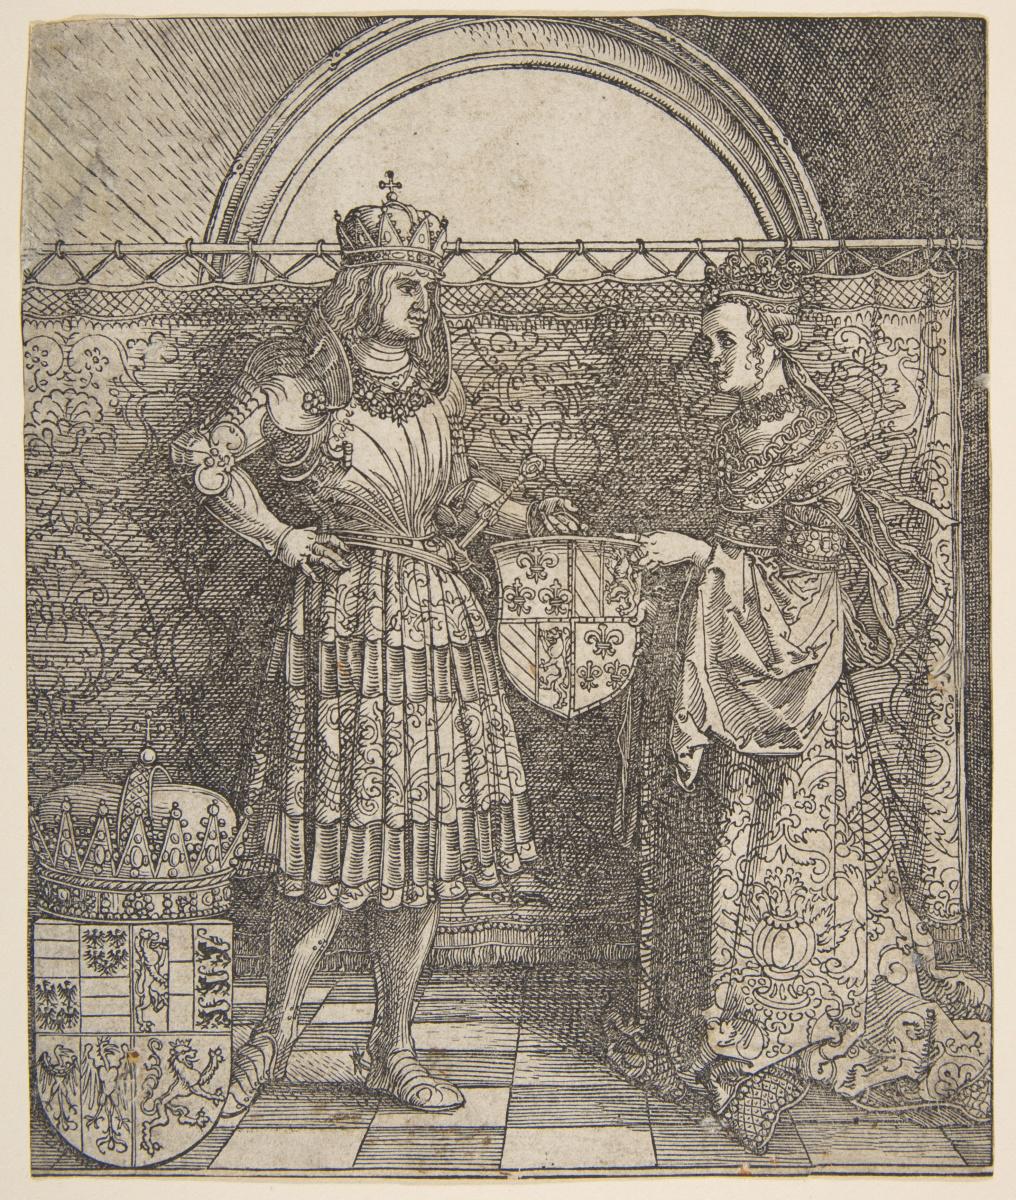 Albrecht Dürer. The Betrothal Of Mary Of Burgundy